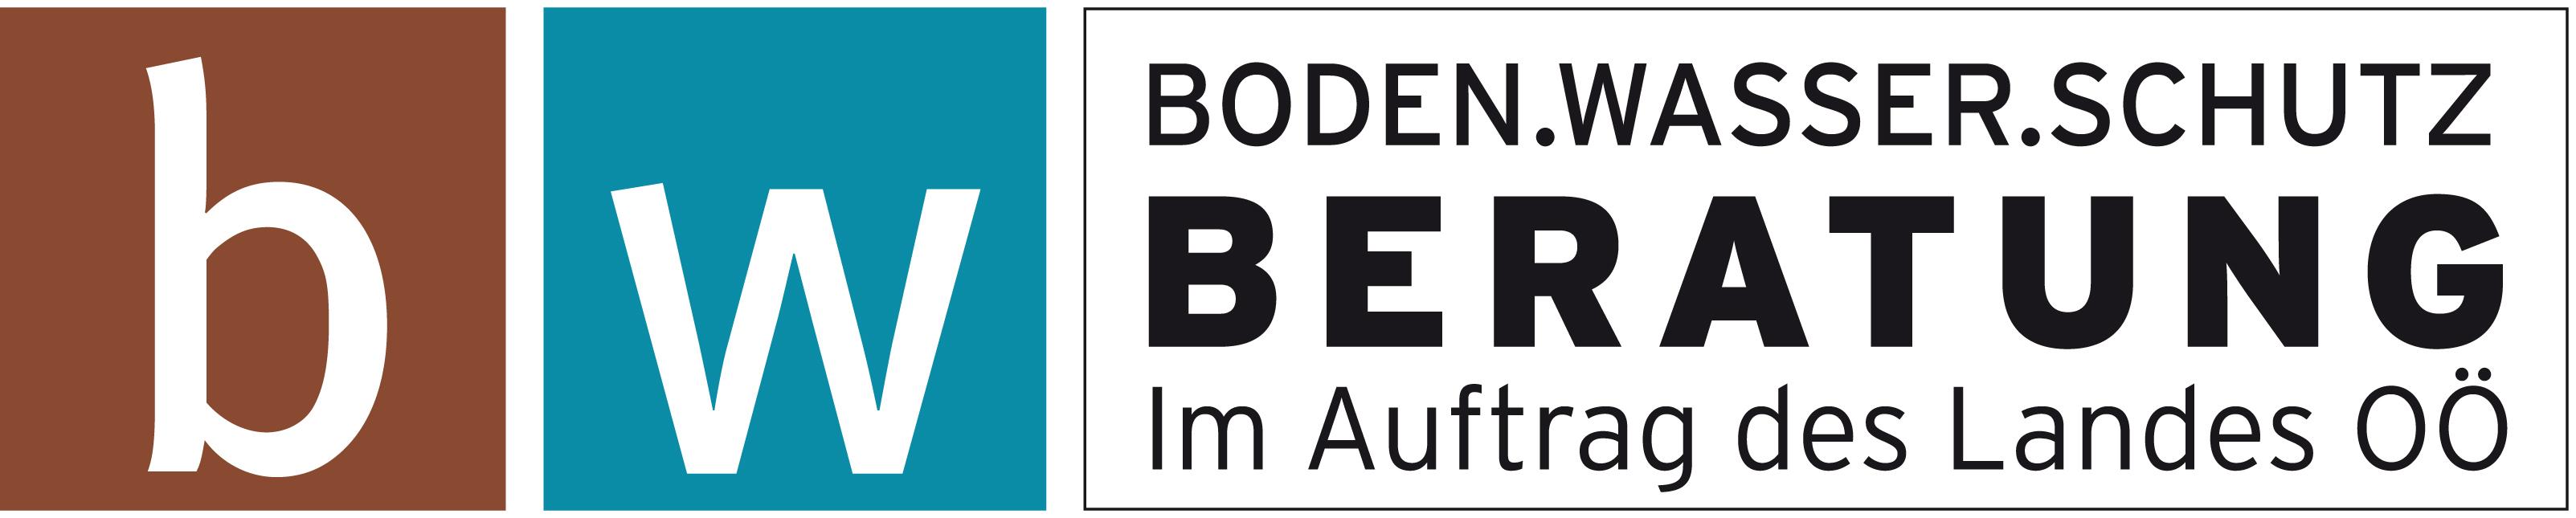 BWSB Logo.jpg